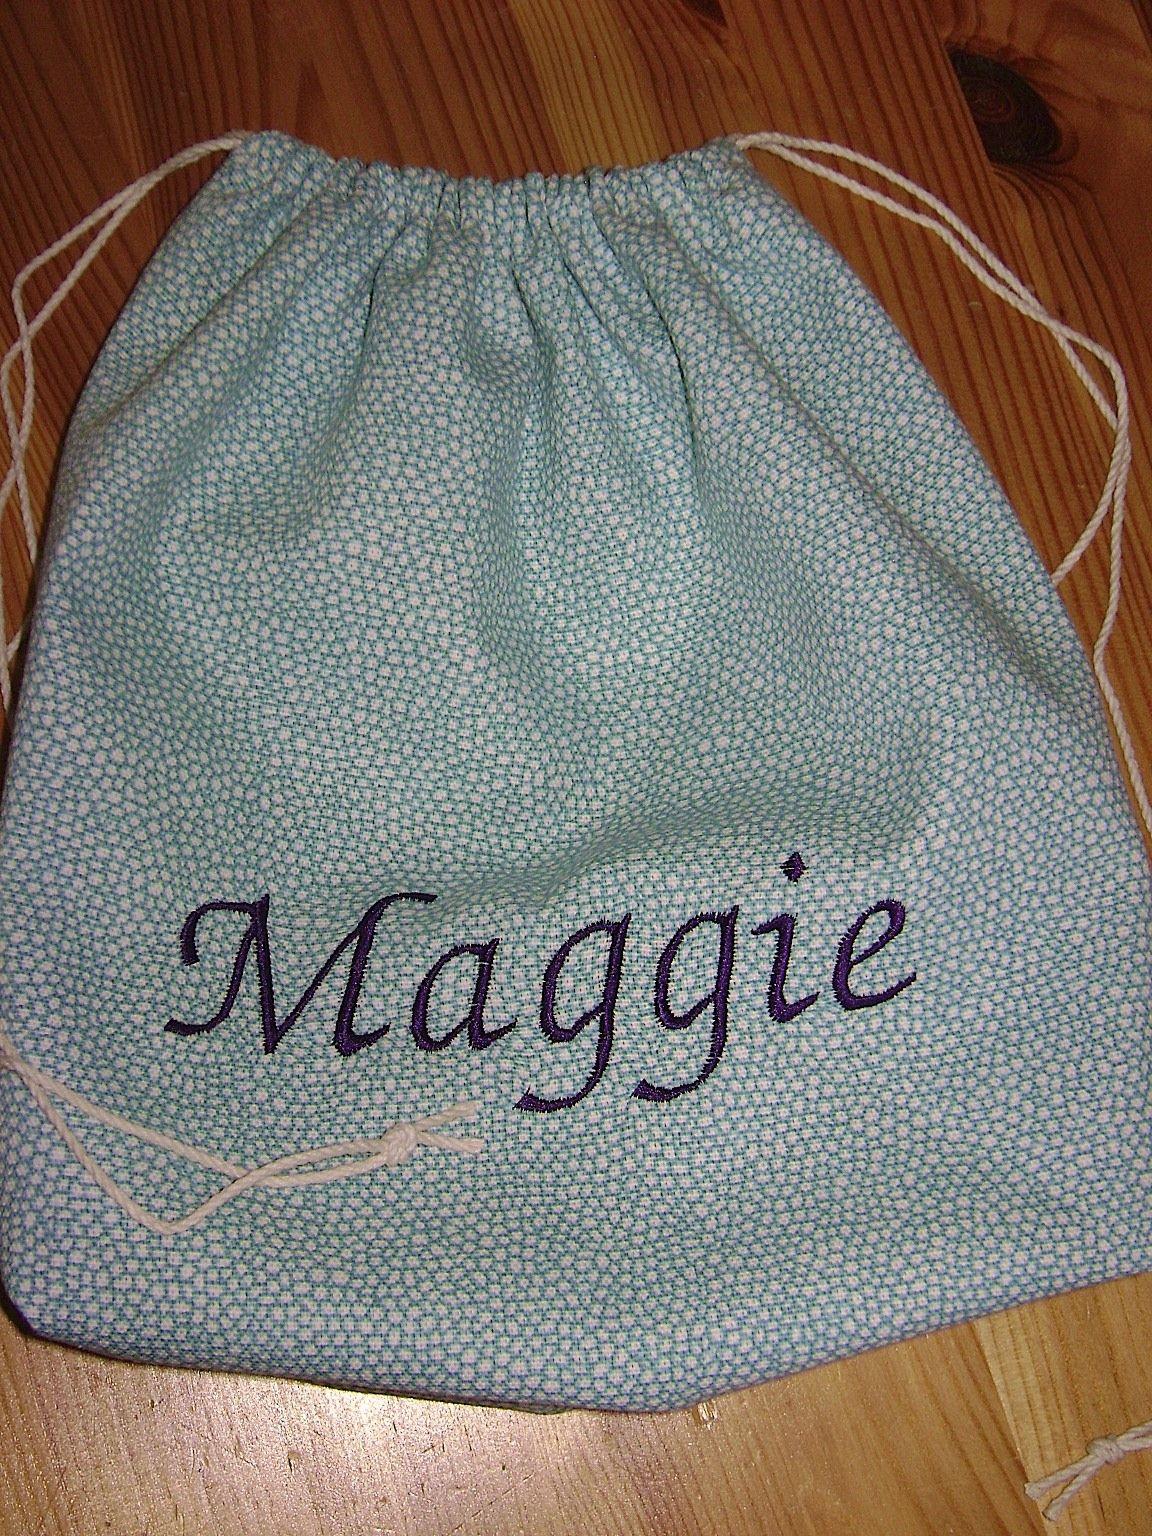 Hanging On By A Thread: Get A Grip-Drawstring Bag Tutorial